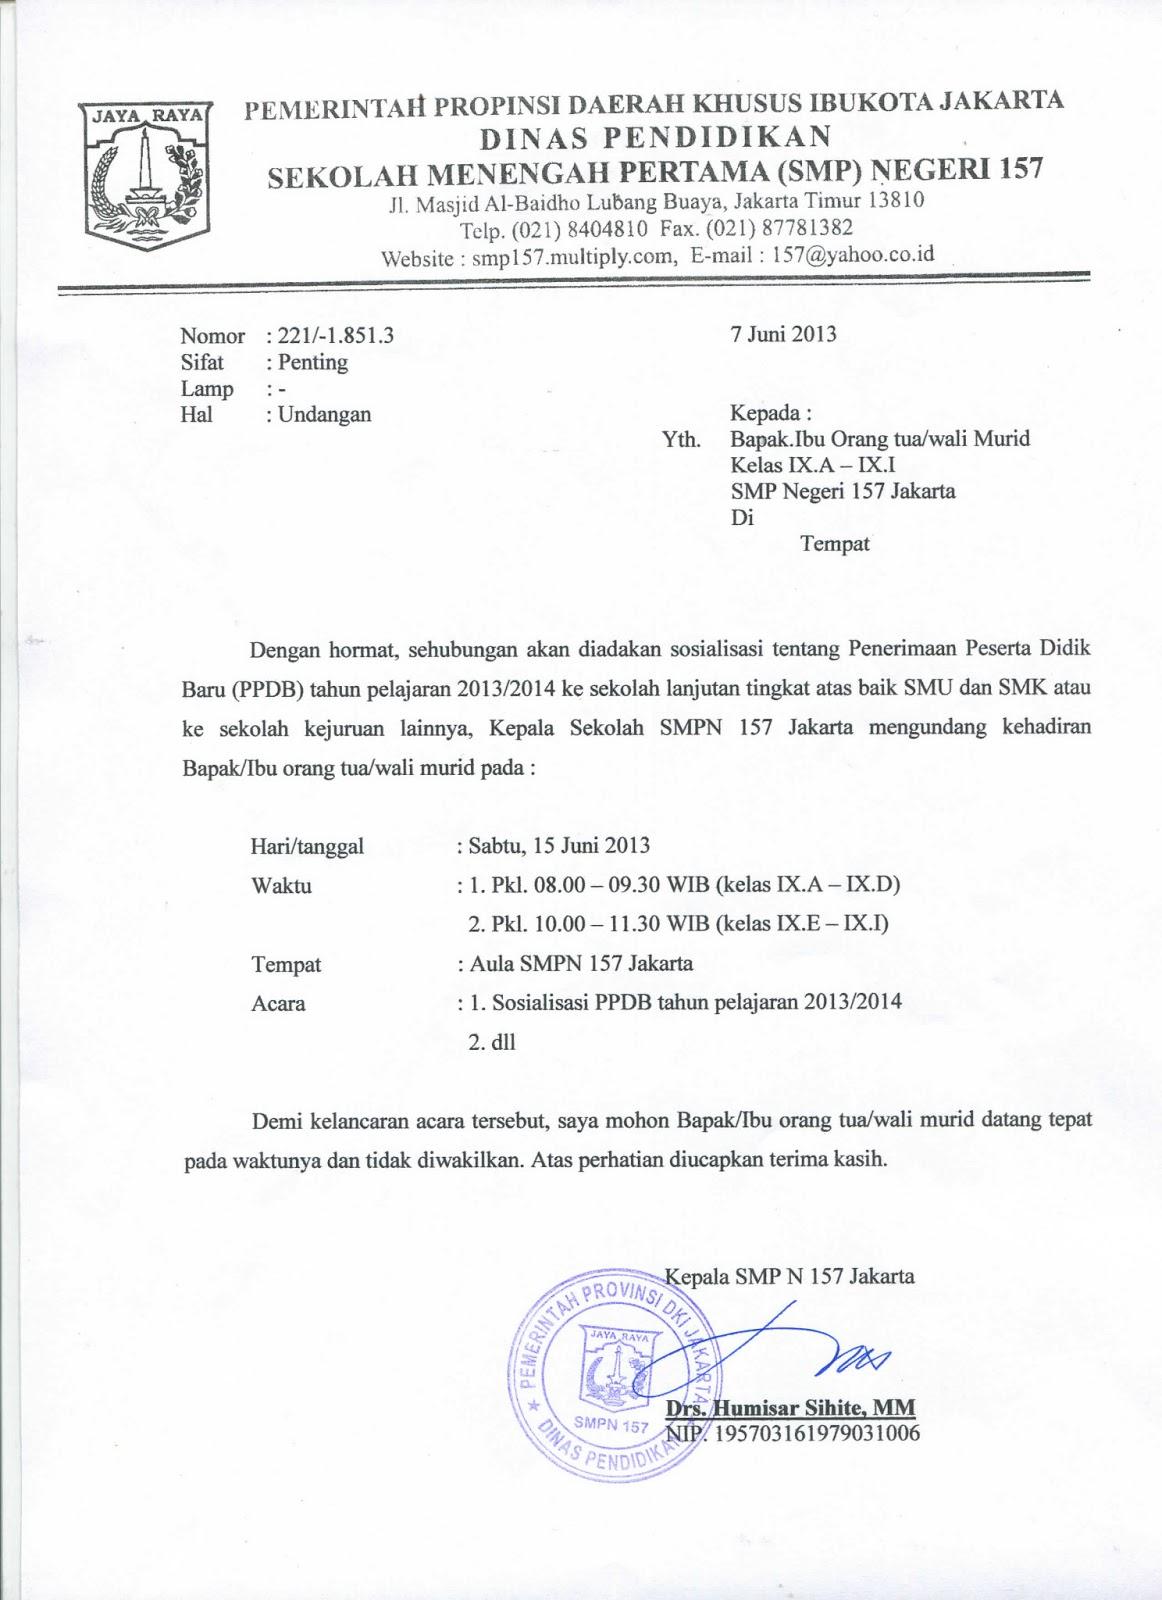 Undangan Rapat Sosialisasi Ppdb 20132014 Smp Negeri 157 Jakarta